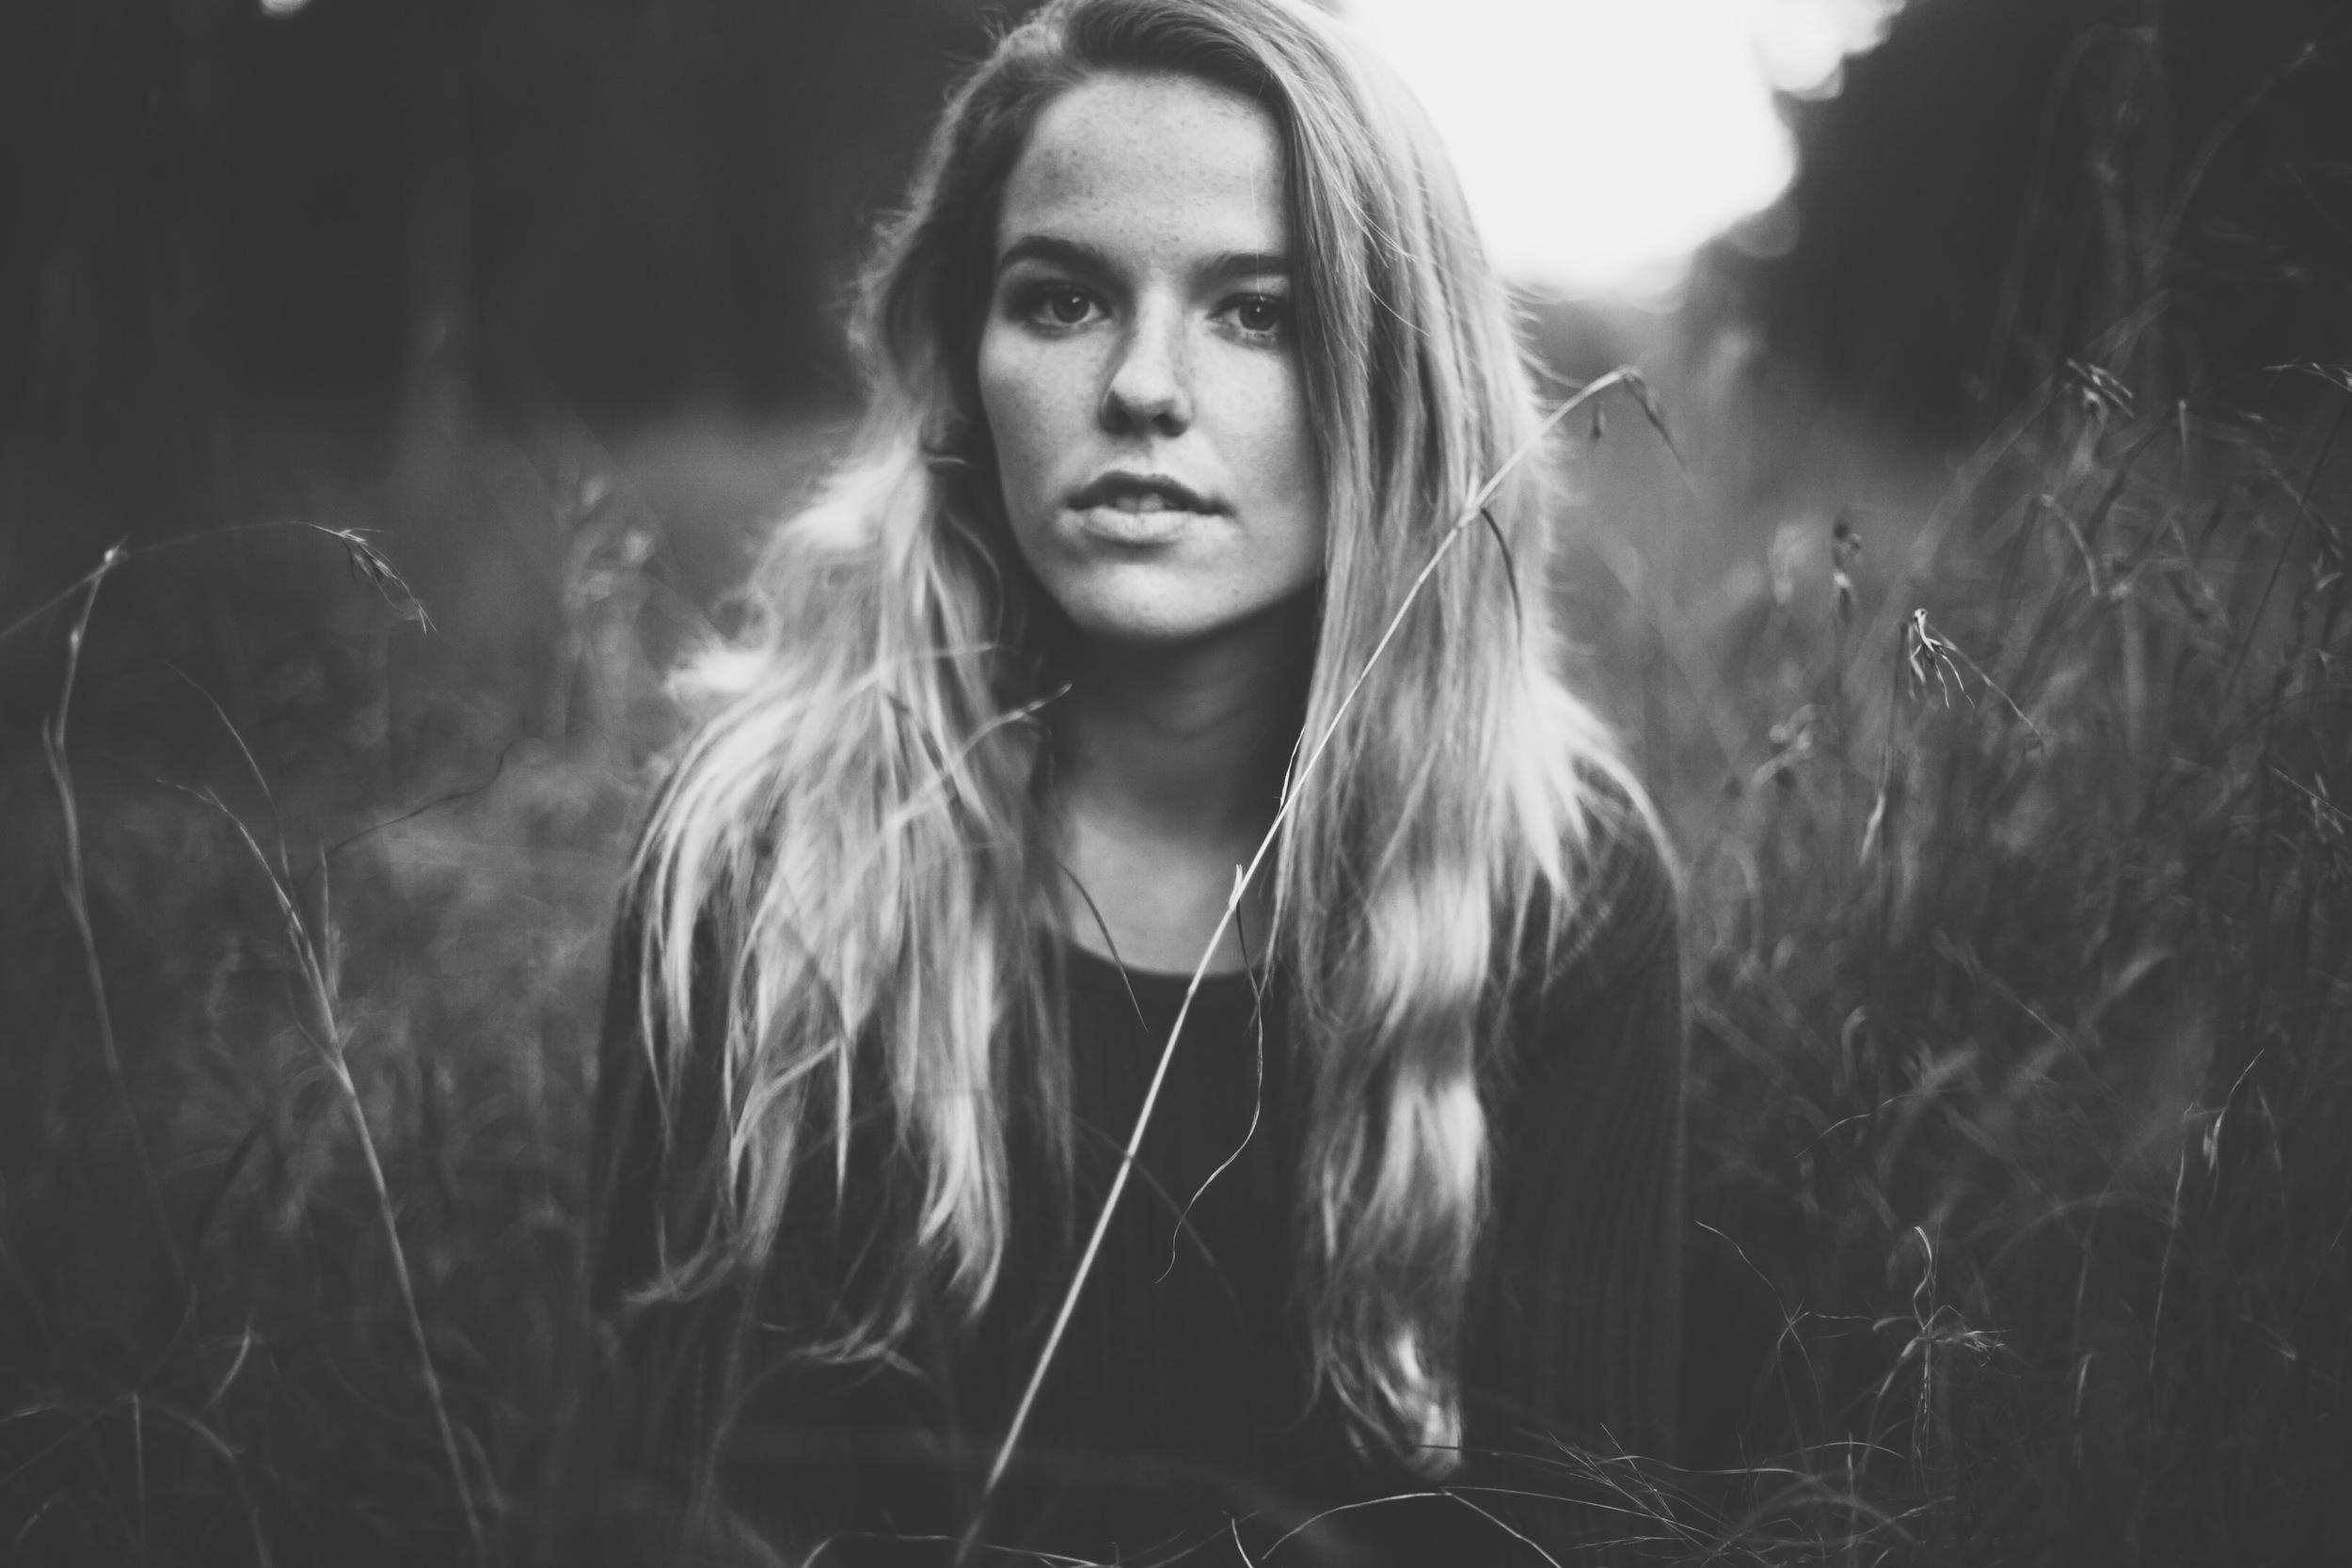 portrait photography sydney